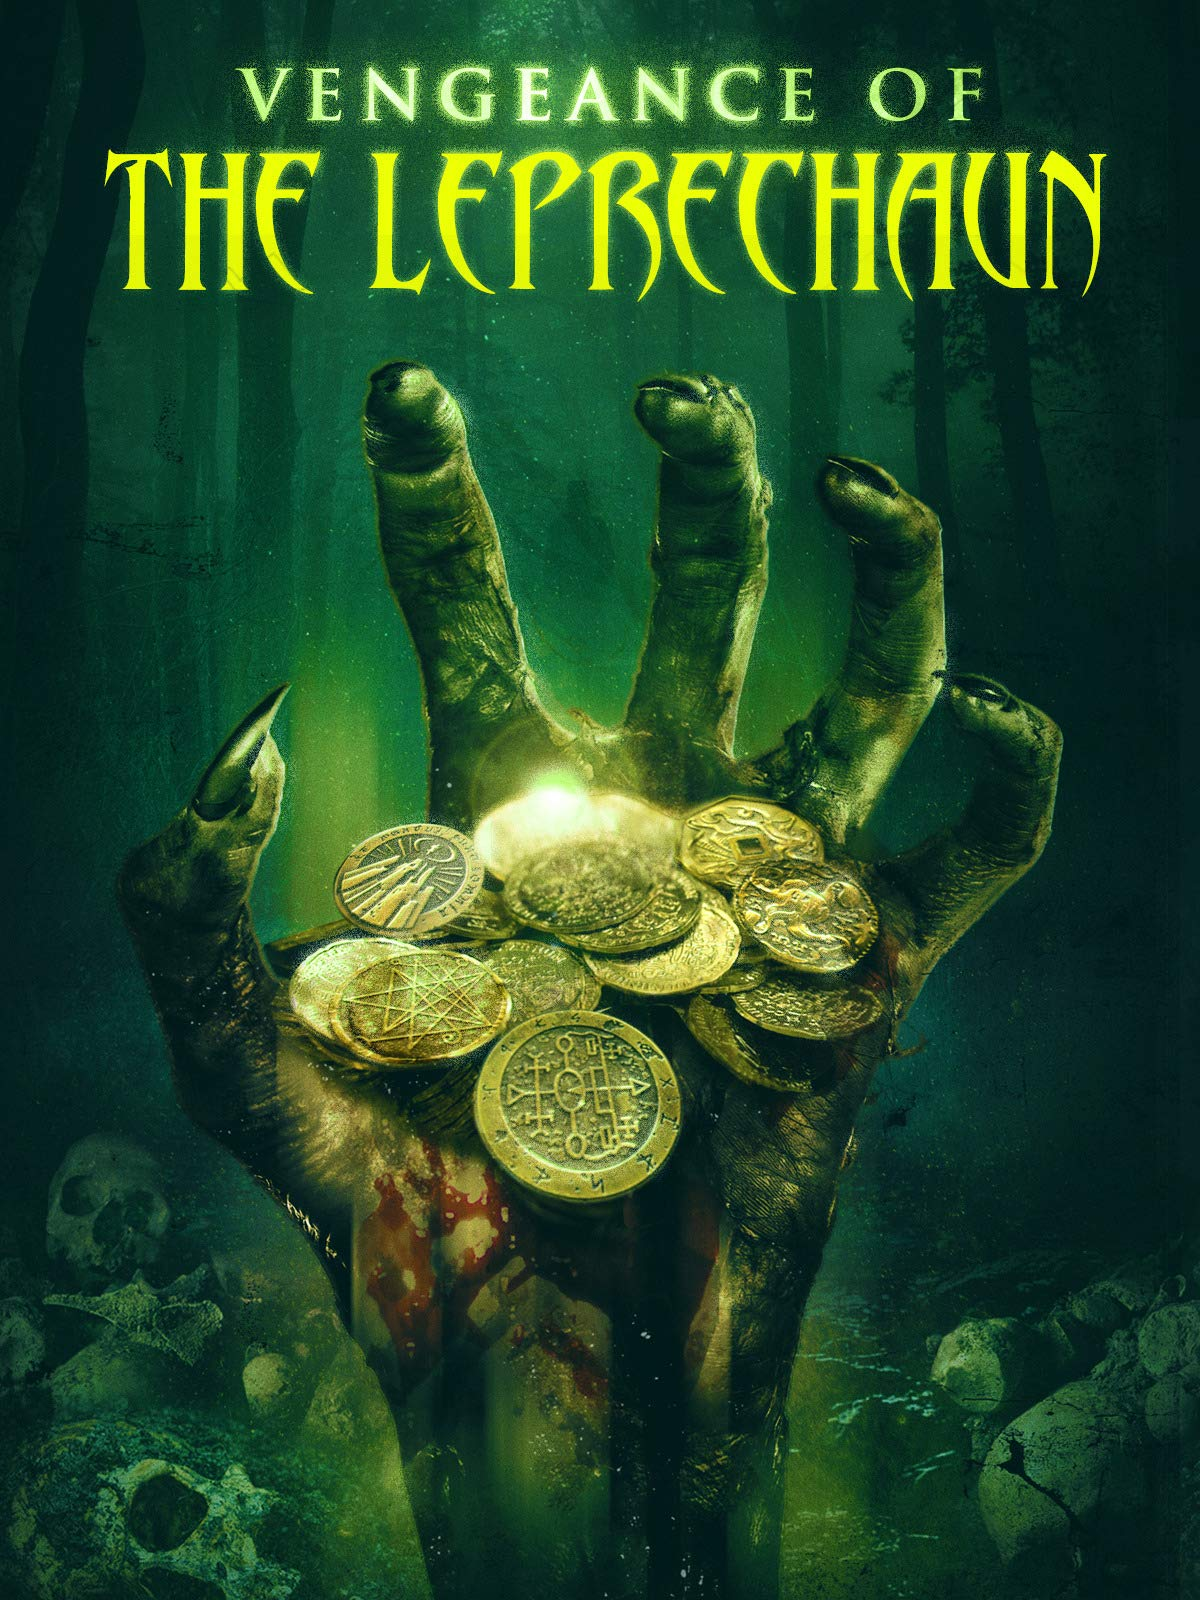 Vengeance of the Leprechaun